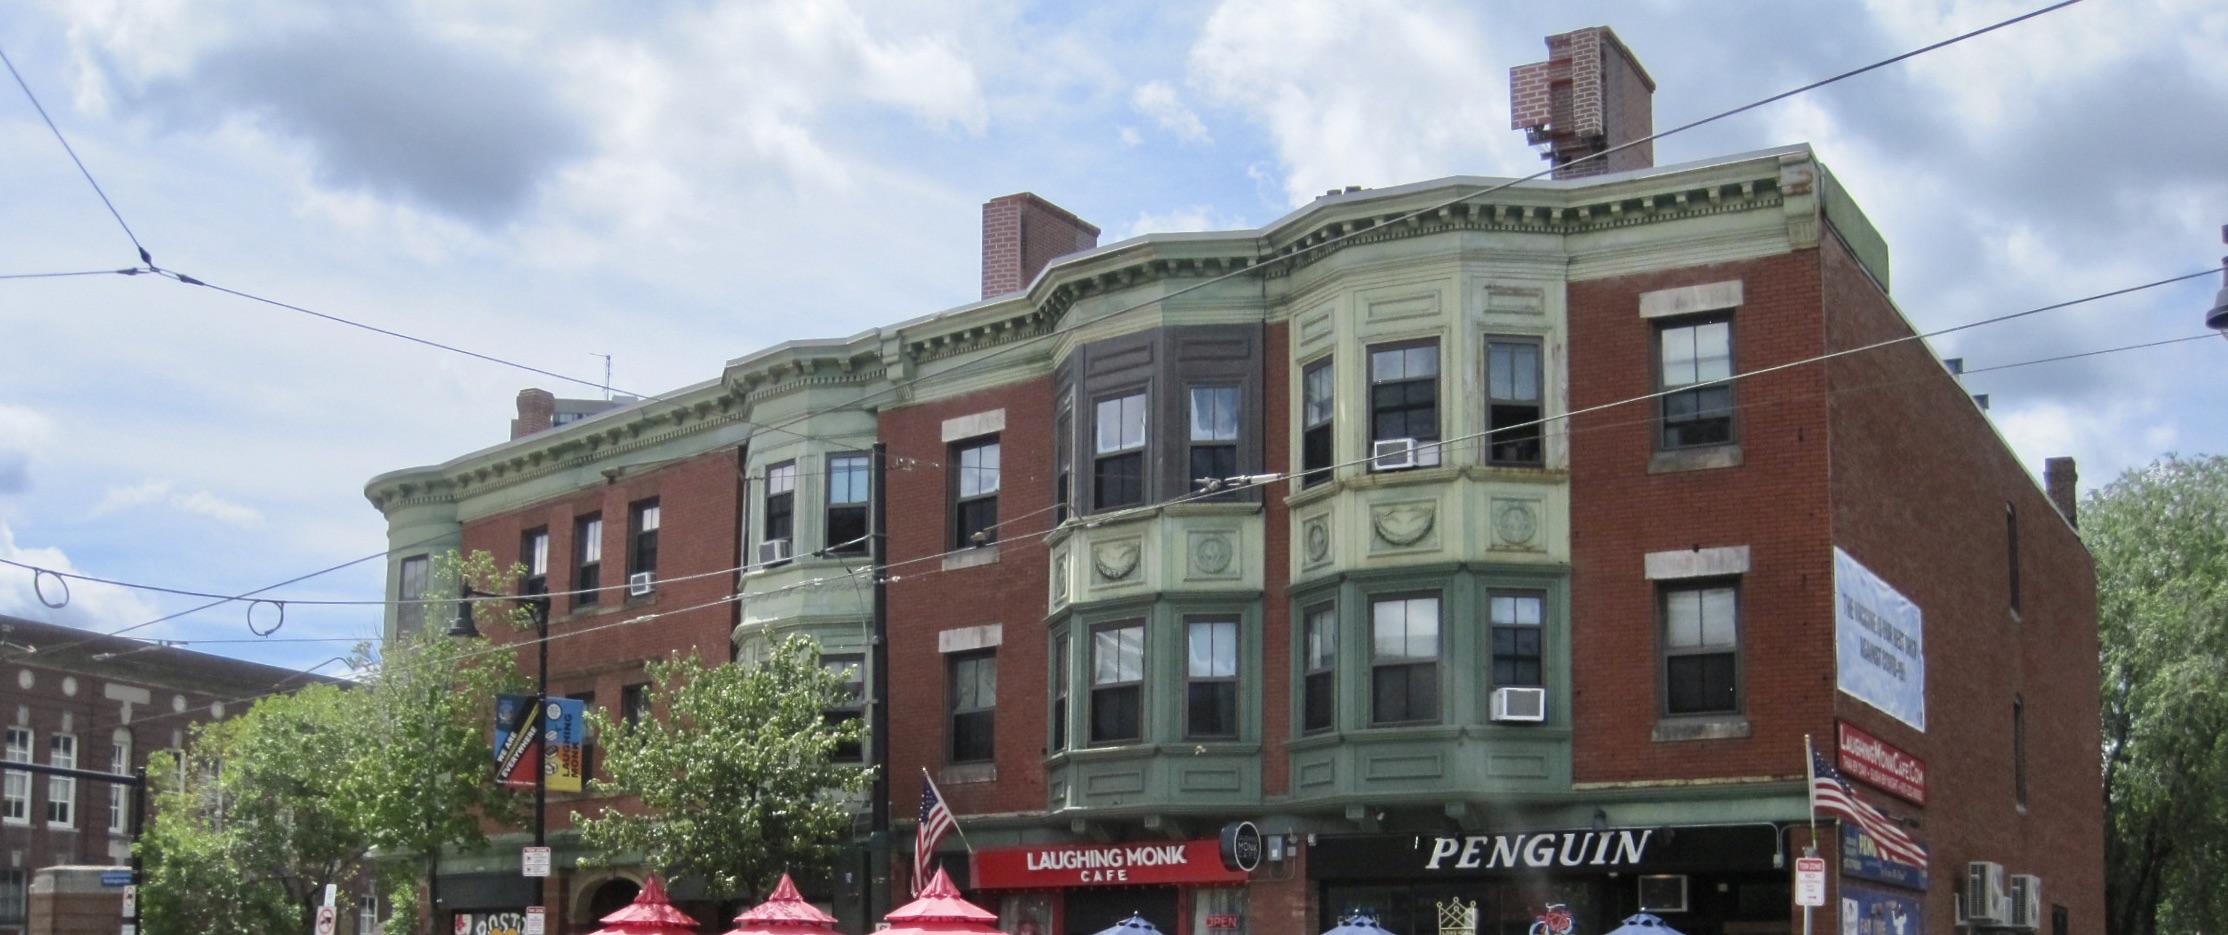 Mission Hill Restaurants on Huntington Avenue